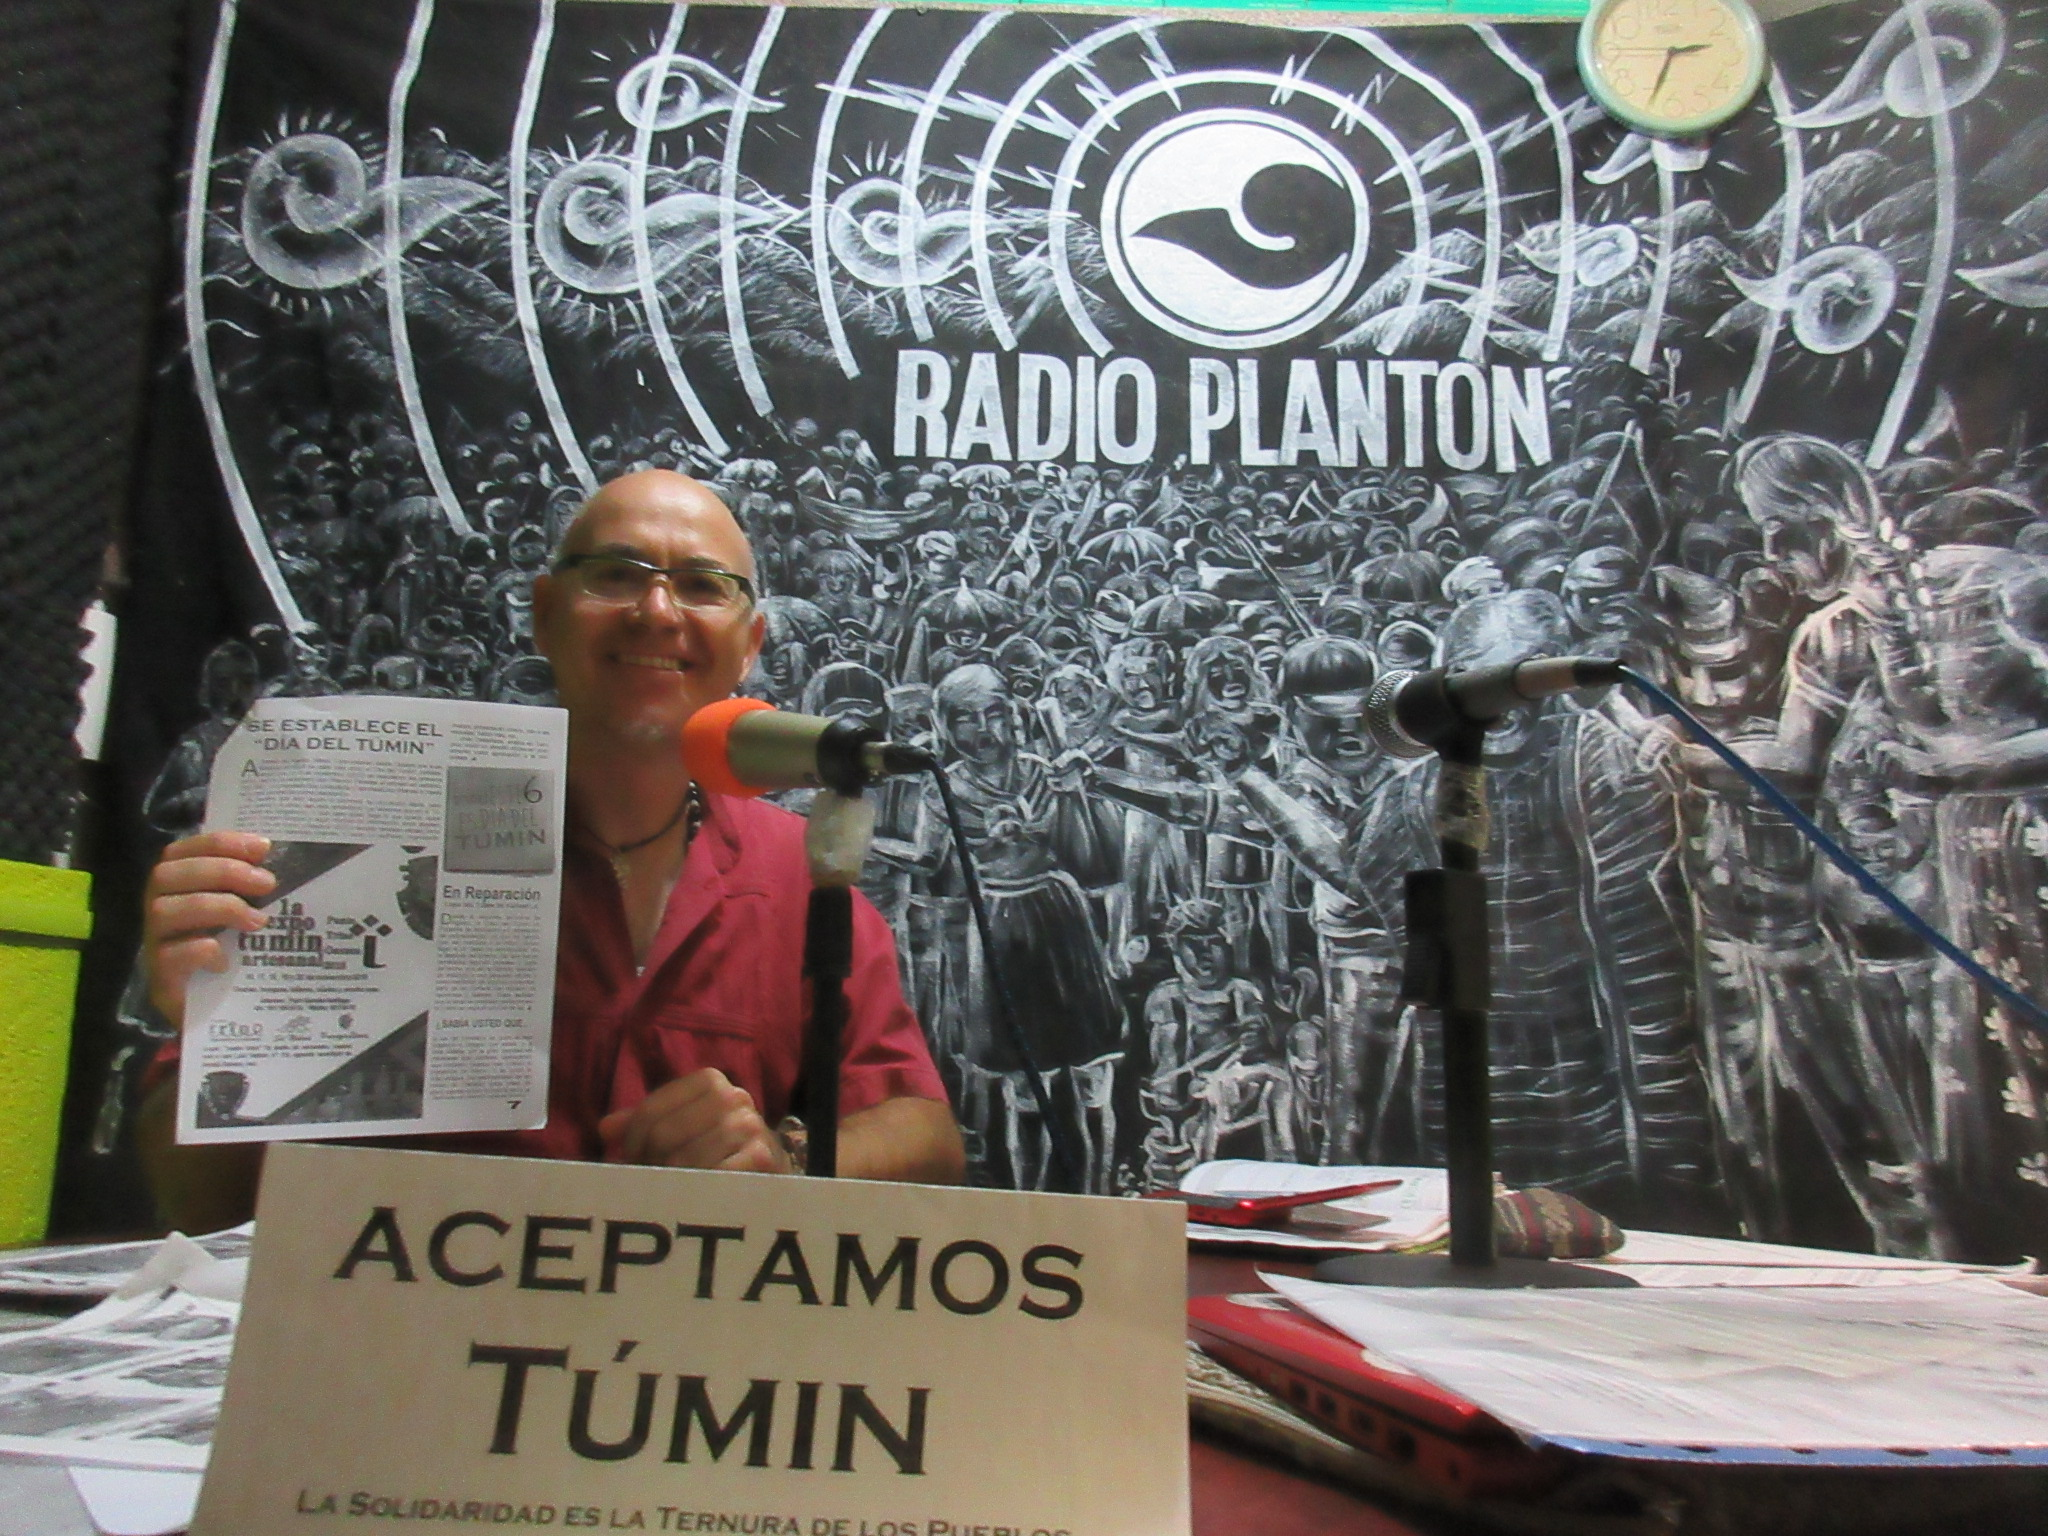 DIA DEL TUMIN en Radio Plantón